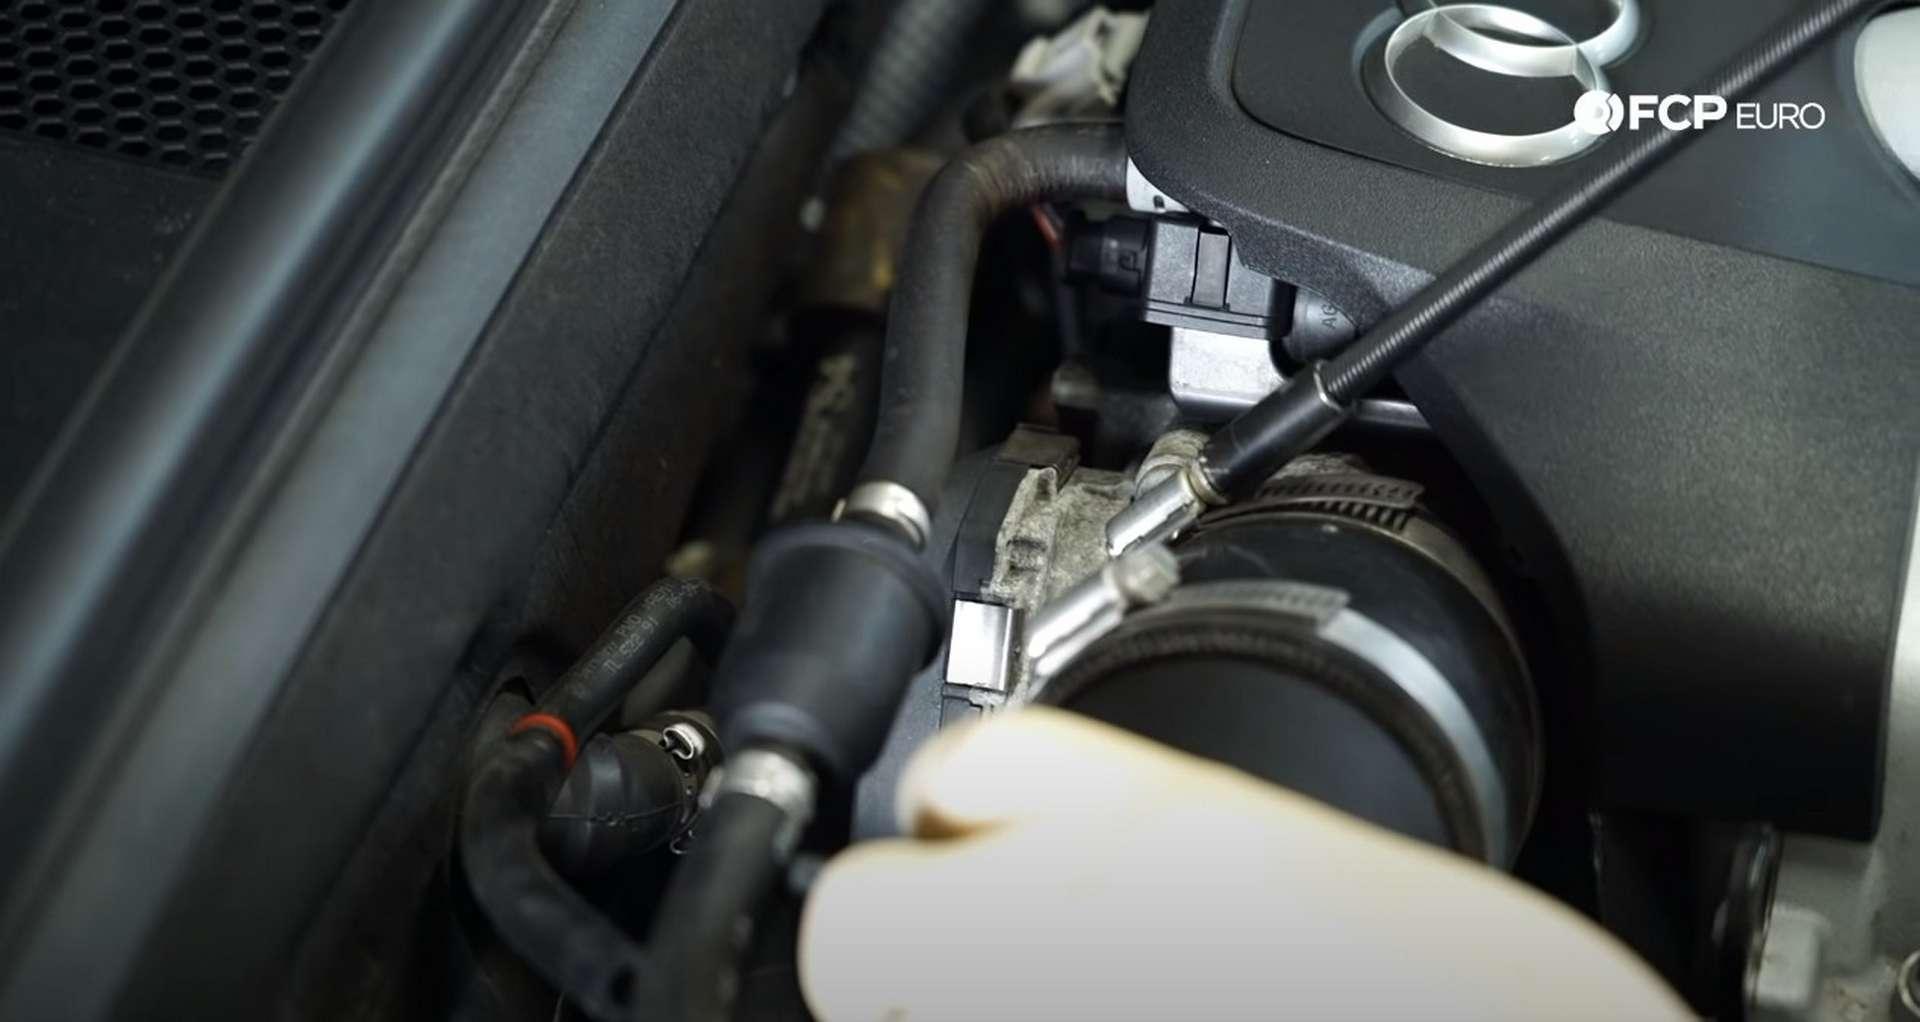 DIY Audi 3.0T Supercharger Oil Change loosening the intake hose clamp